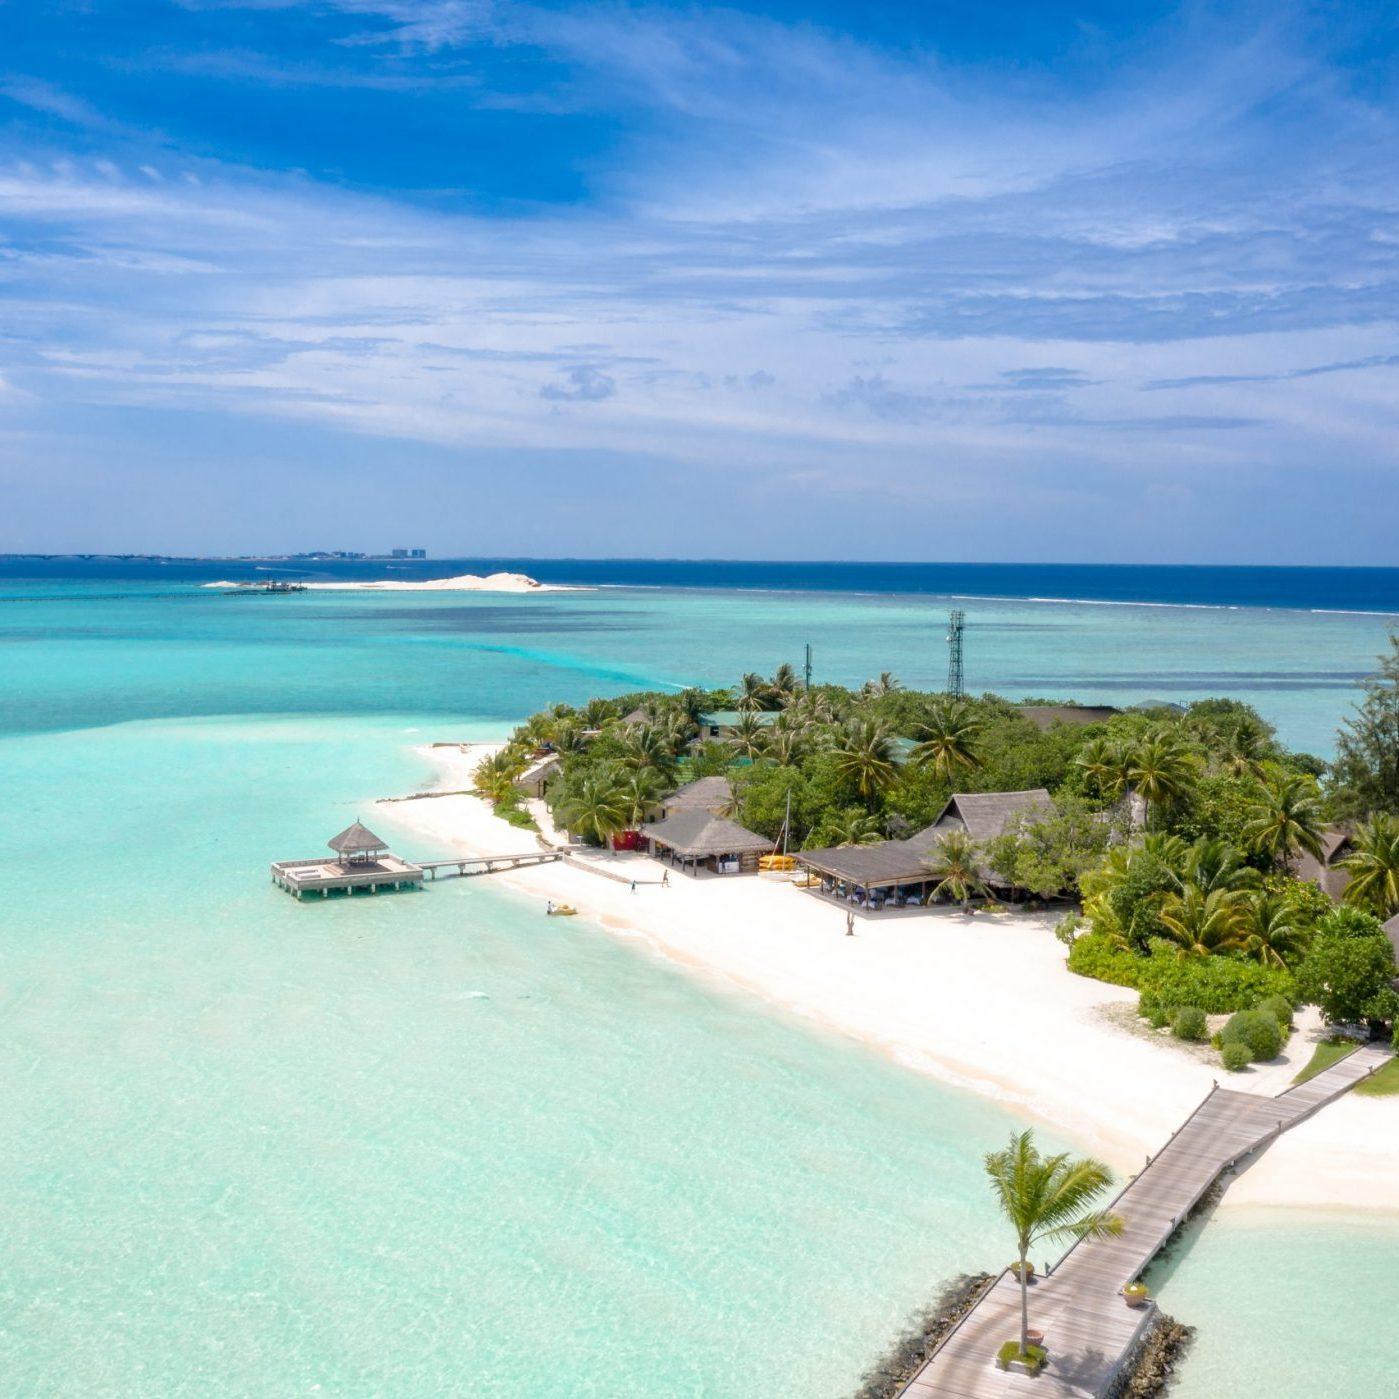 Royal-Caribbean-Vacation-Package-Angela-Johnson-Travel-Agent